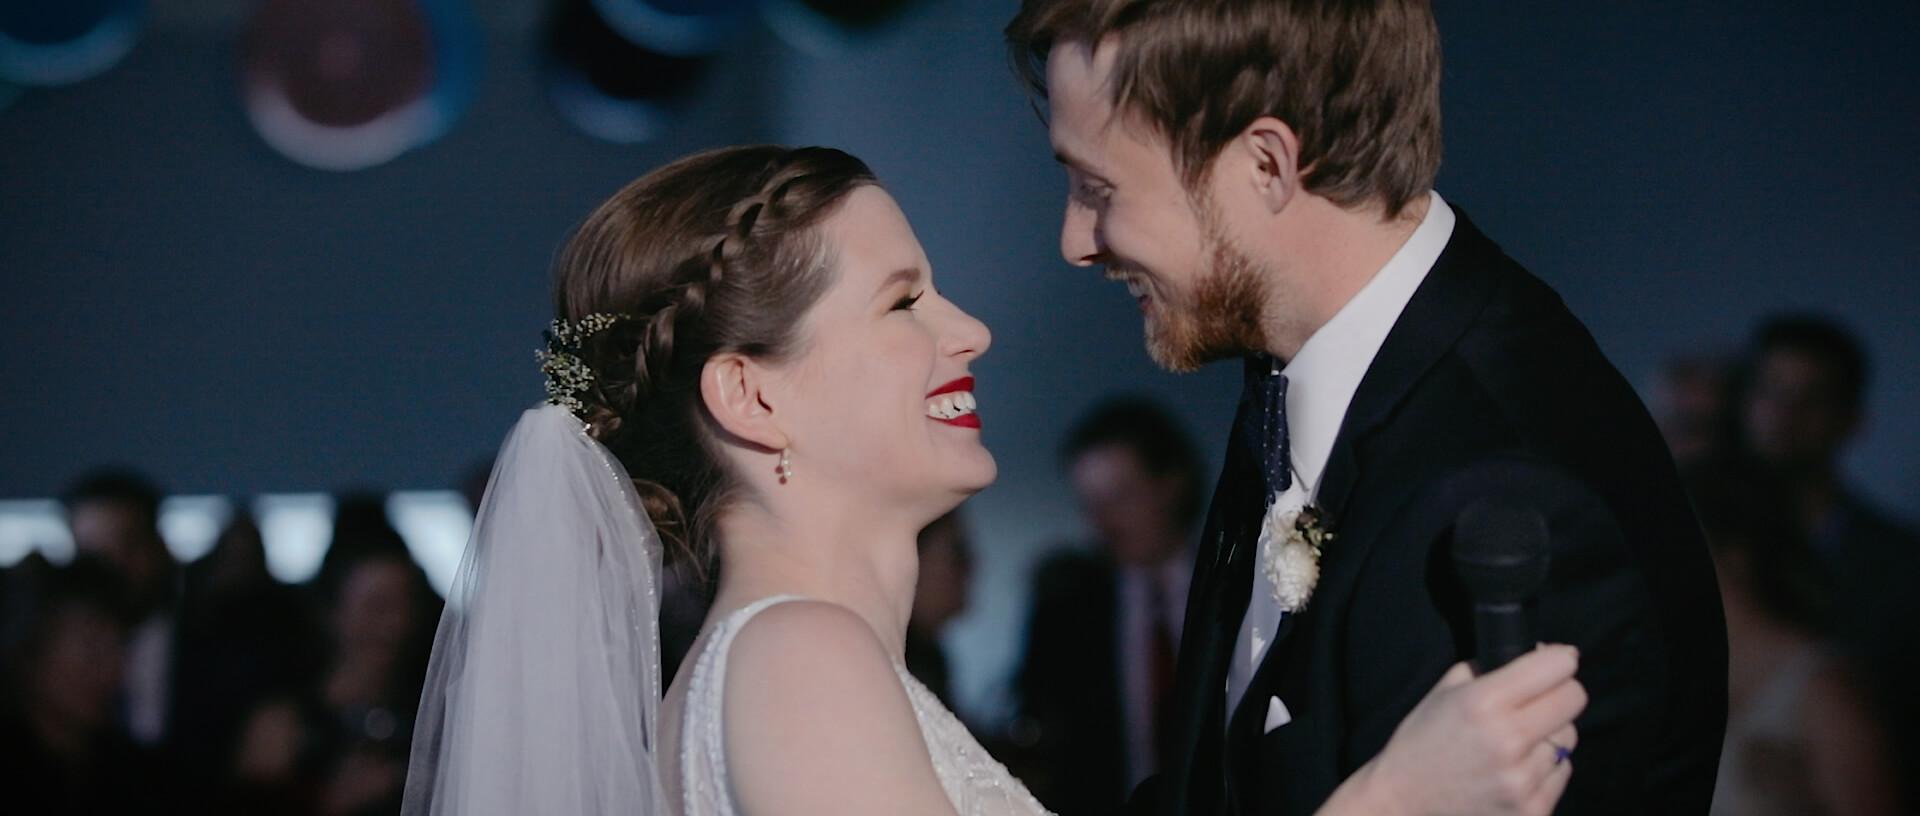 the walker wedding film.jpg